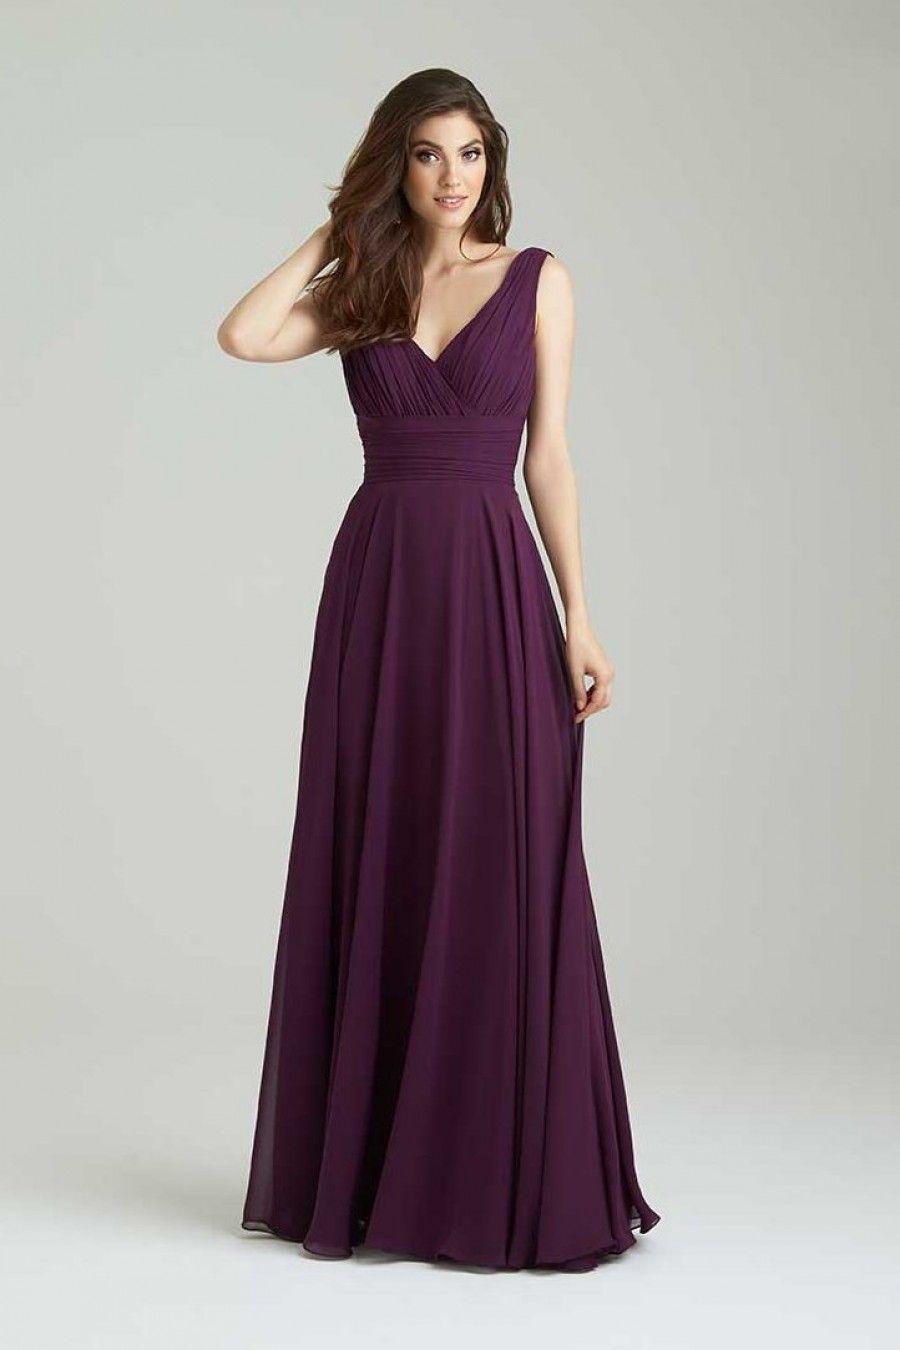 Allure Bridals Bridesmaids Dress Style 1455 Perfect Bridal